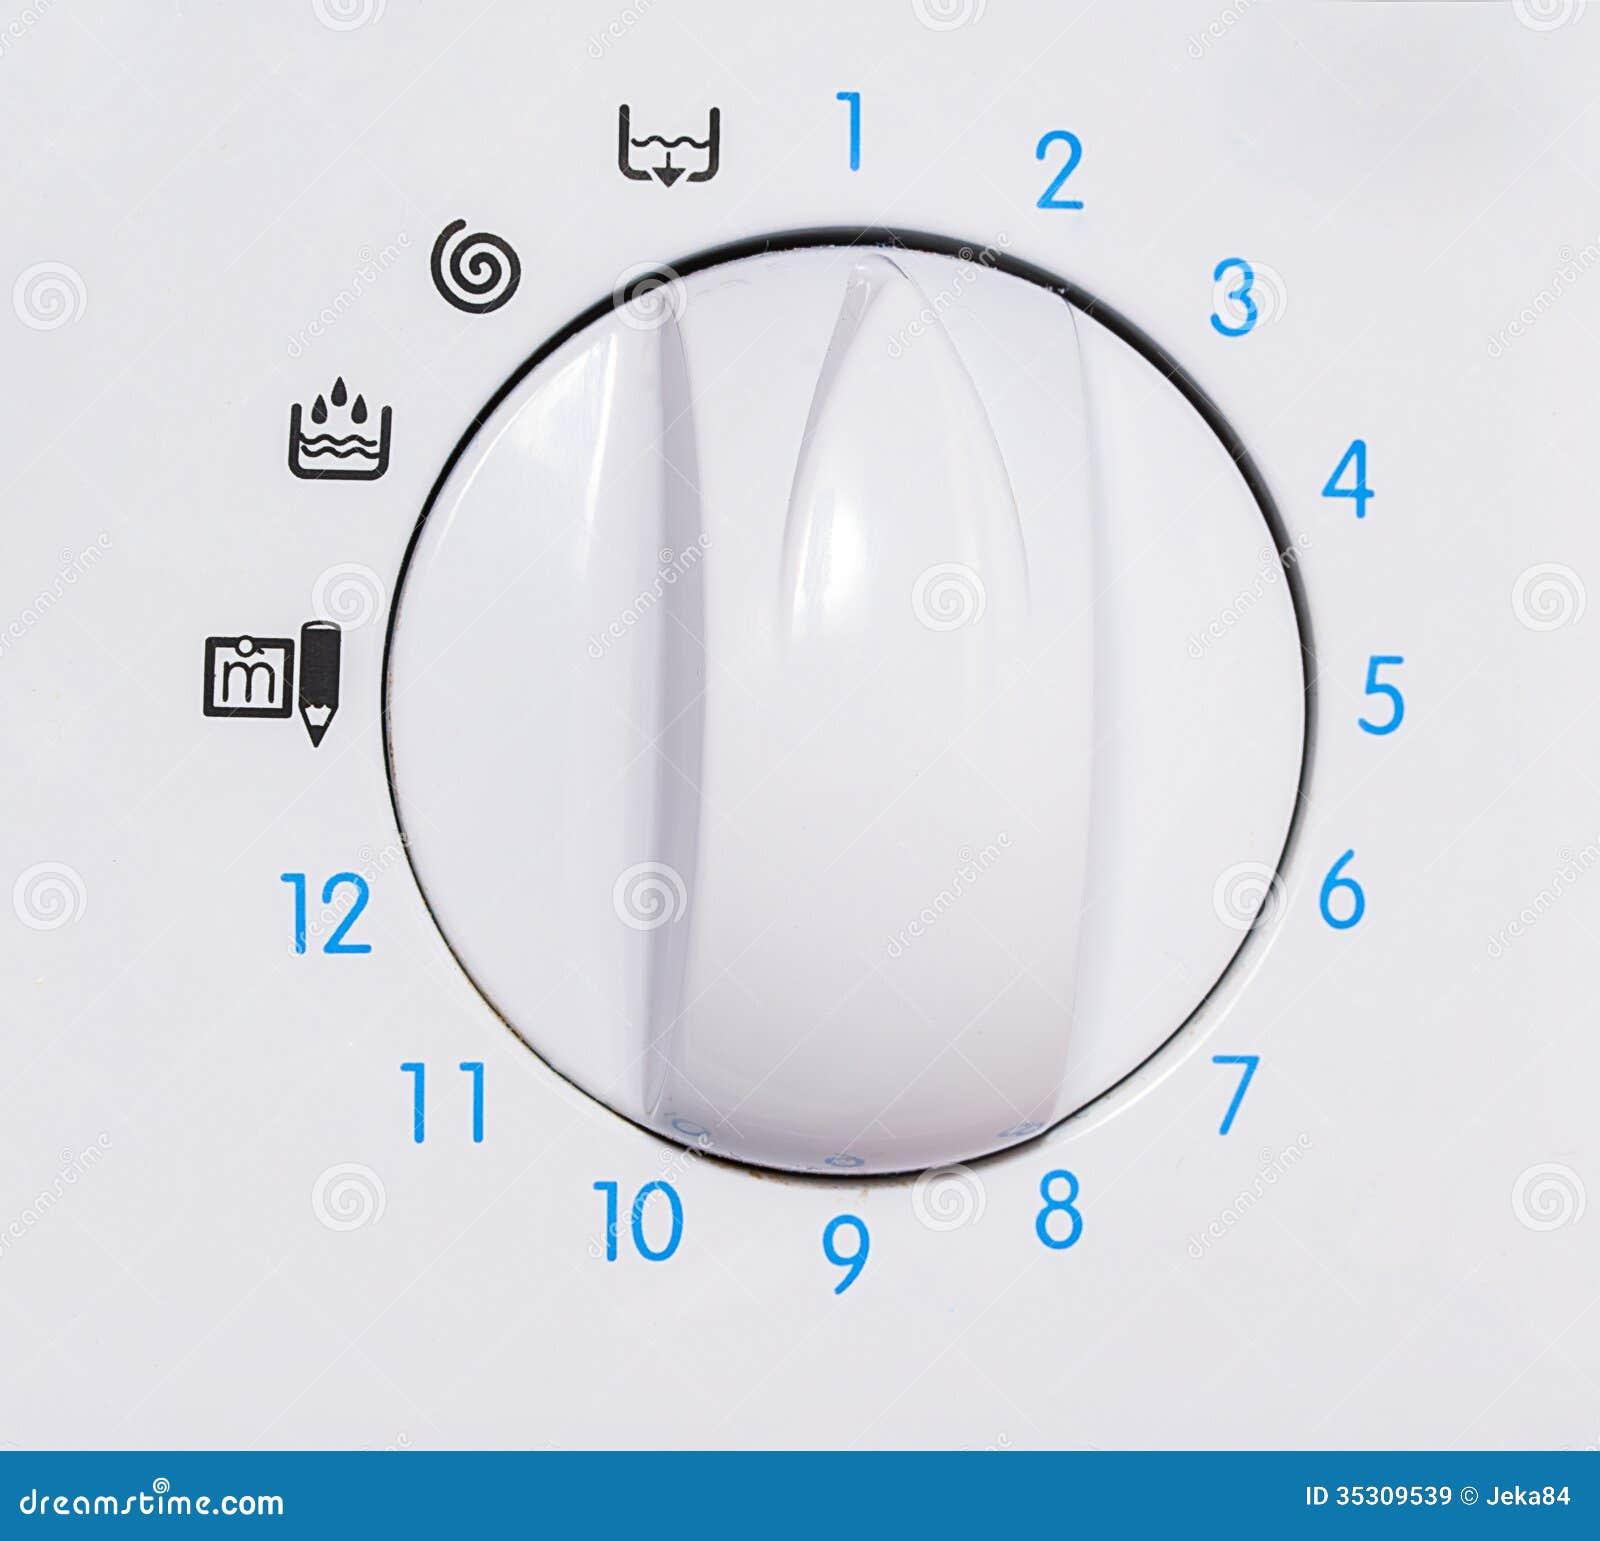 Washing Machine Controls : Washing machine control panel stock image